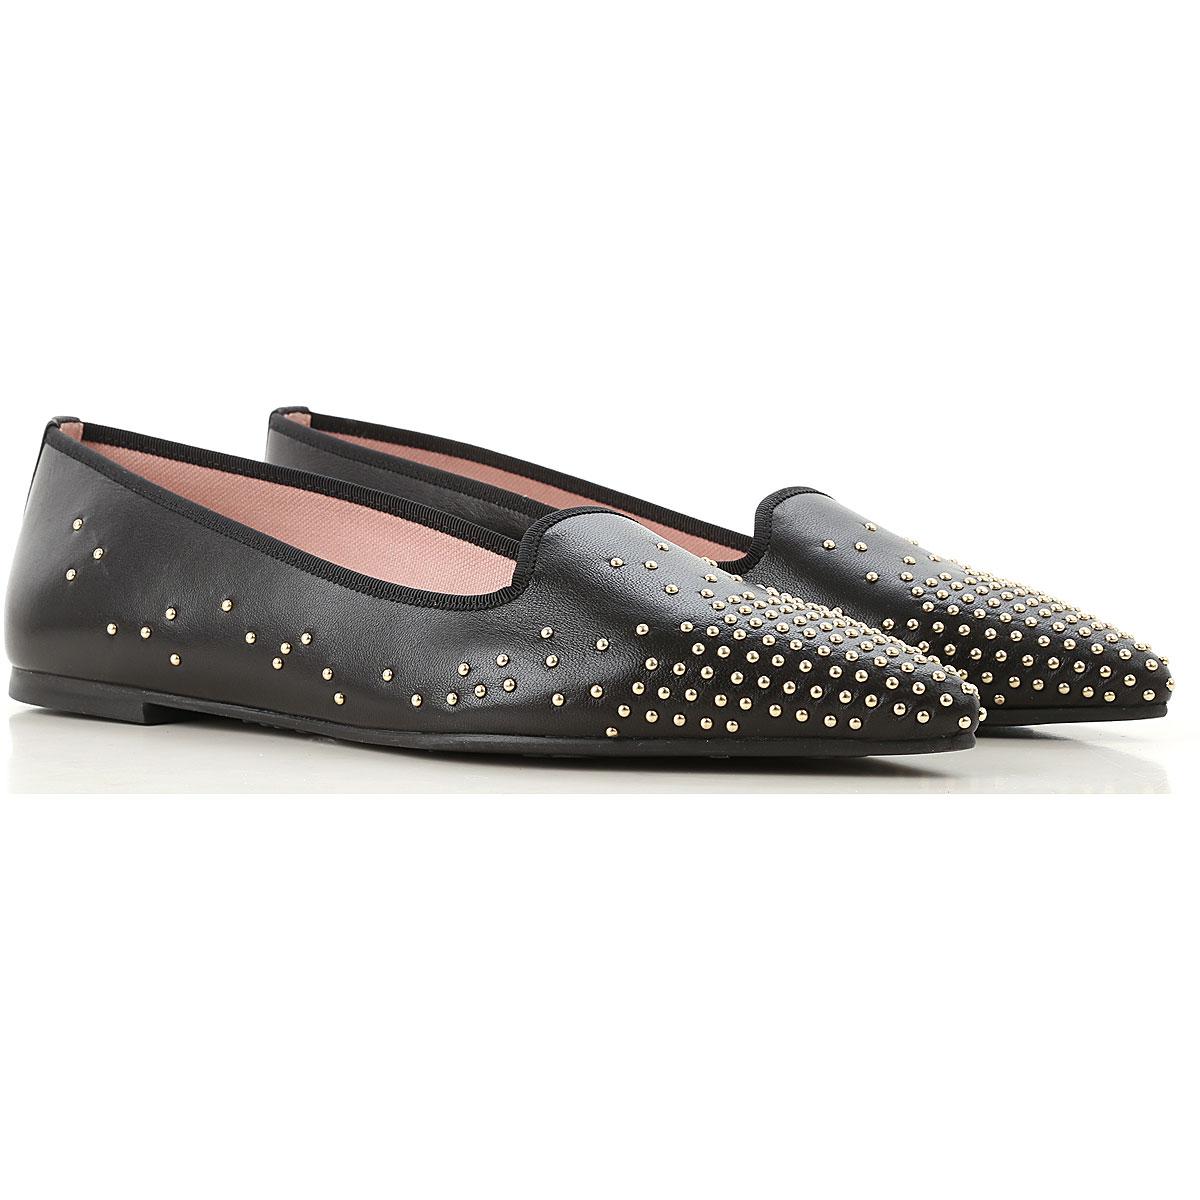 Image of Pretty Ballerinas Ballet Flats Ballerina Shoes for Women, Black, Leather, 2017, 6 7 8 9